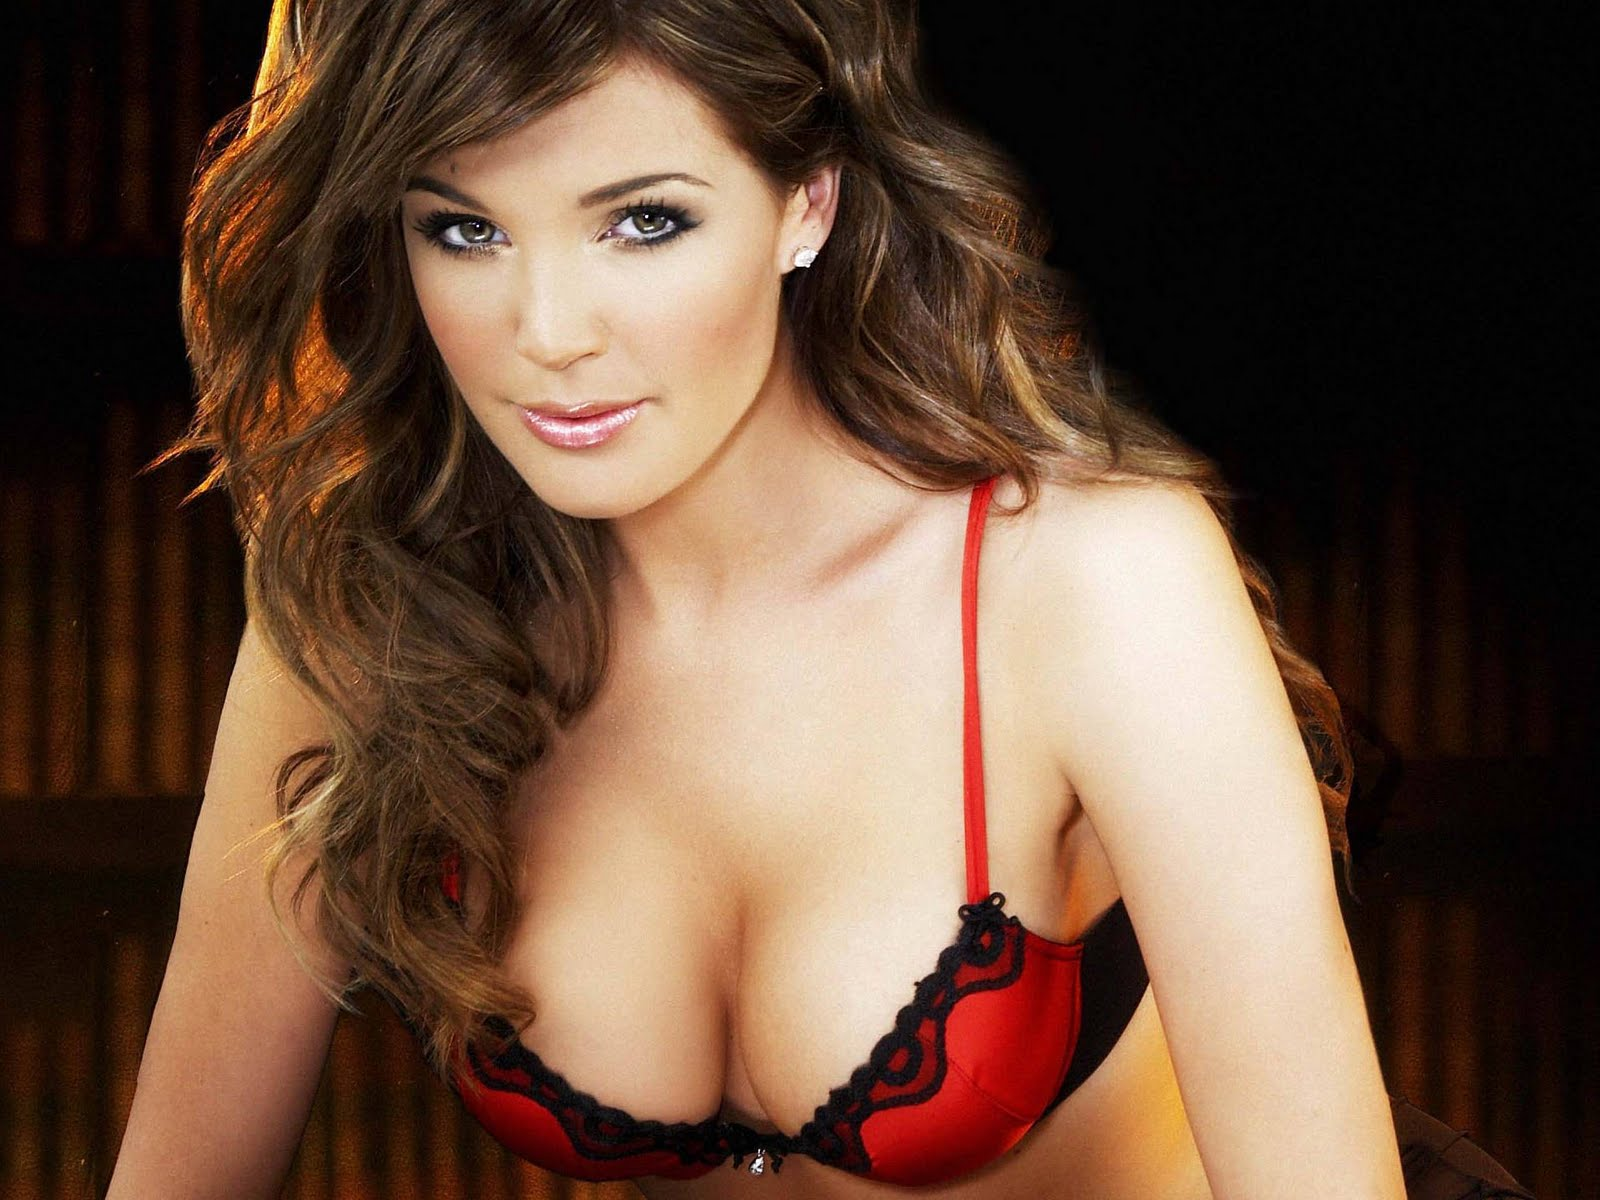 English Glamour Model Danielle Lloyd Desktop Wallpapers